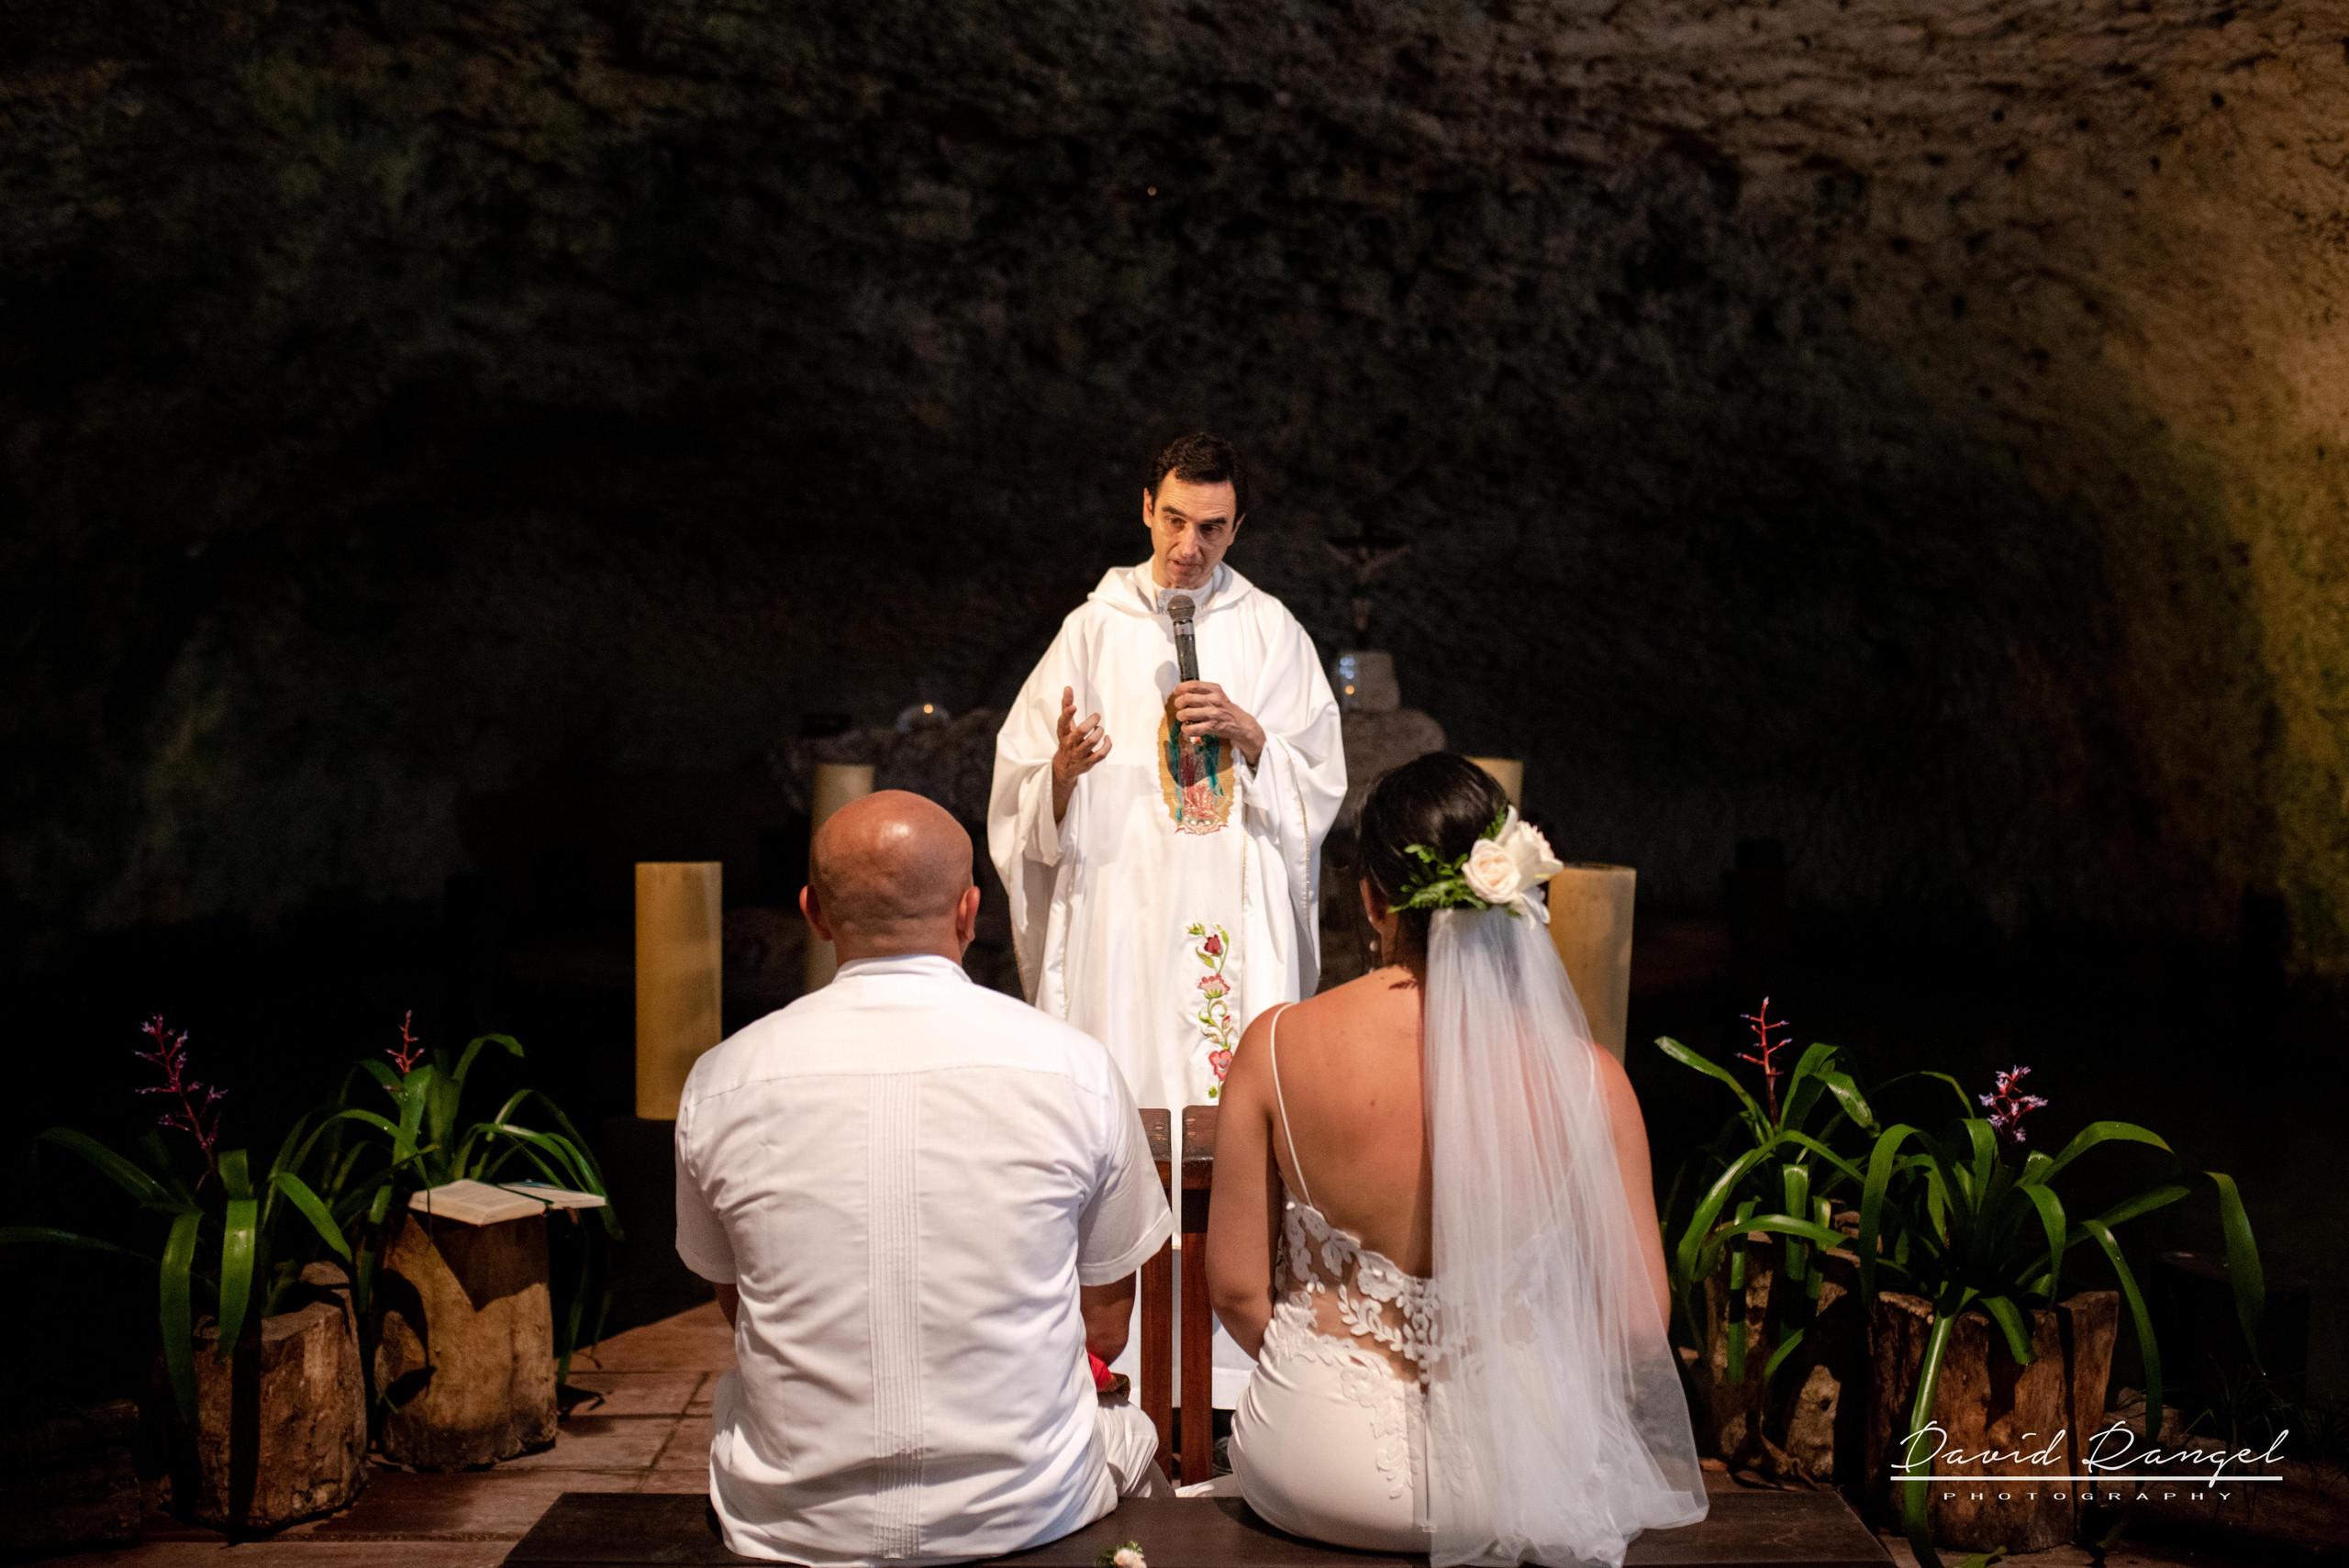 bride+groom+ceremony+minister+padre+misa+vows+cenote+wedding